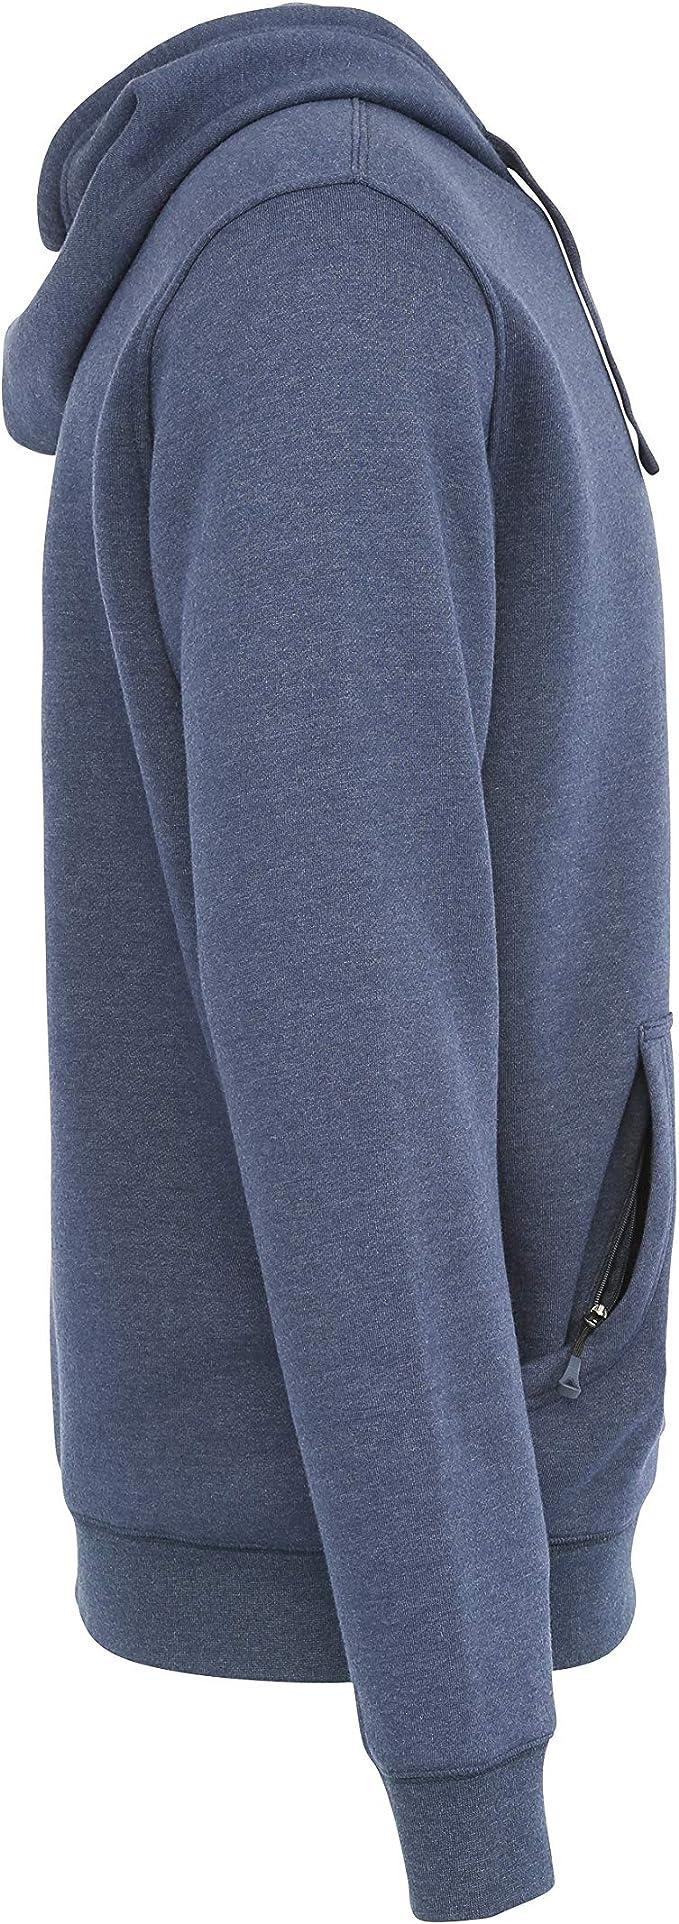 LA Police Gear Soft Comfortable Core CCW Hoodie